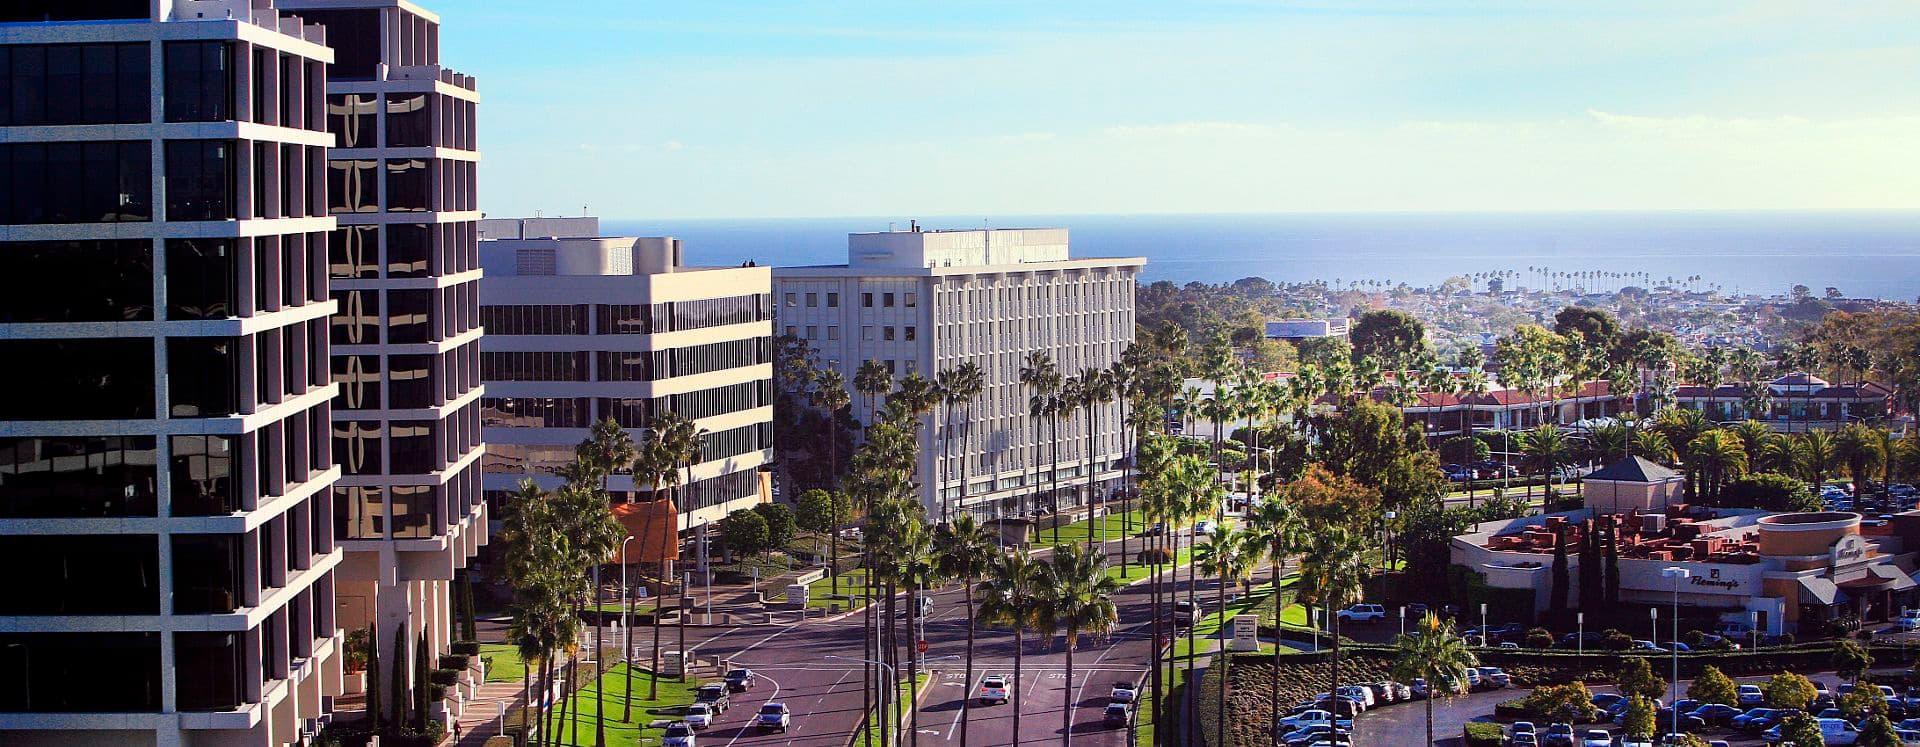 Aerial photography of 500 block of Newport Center, Newport, Ca